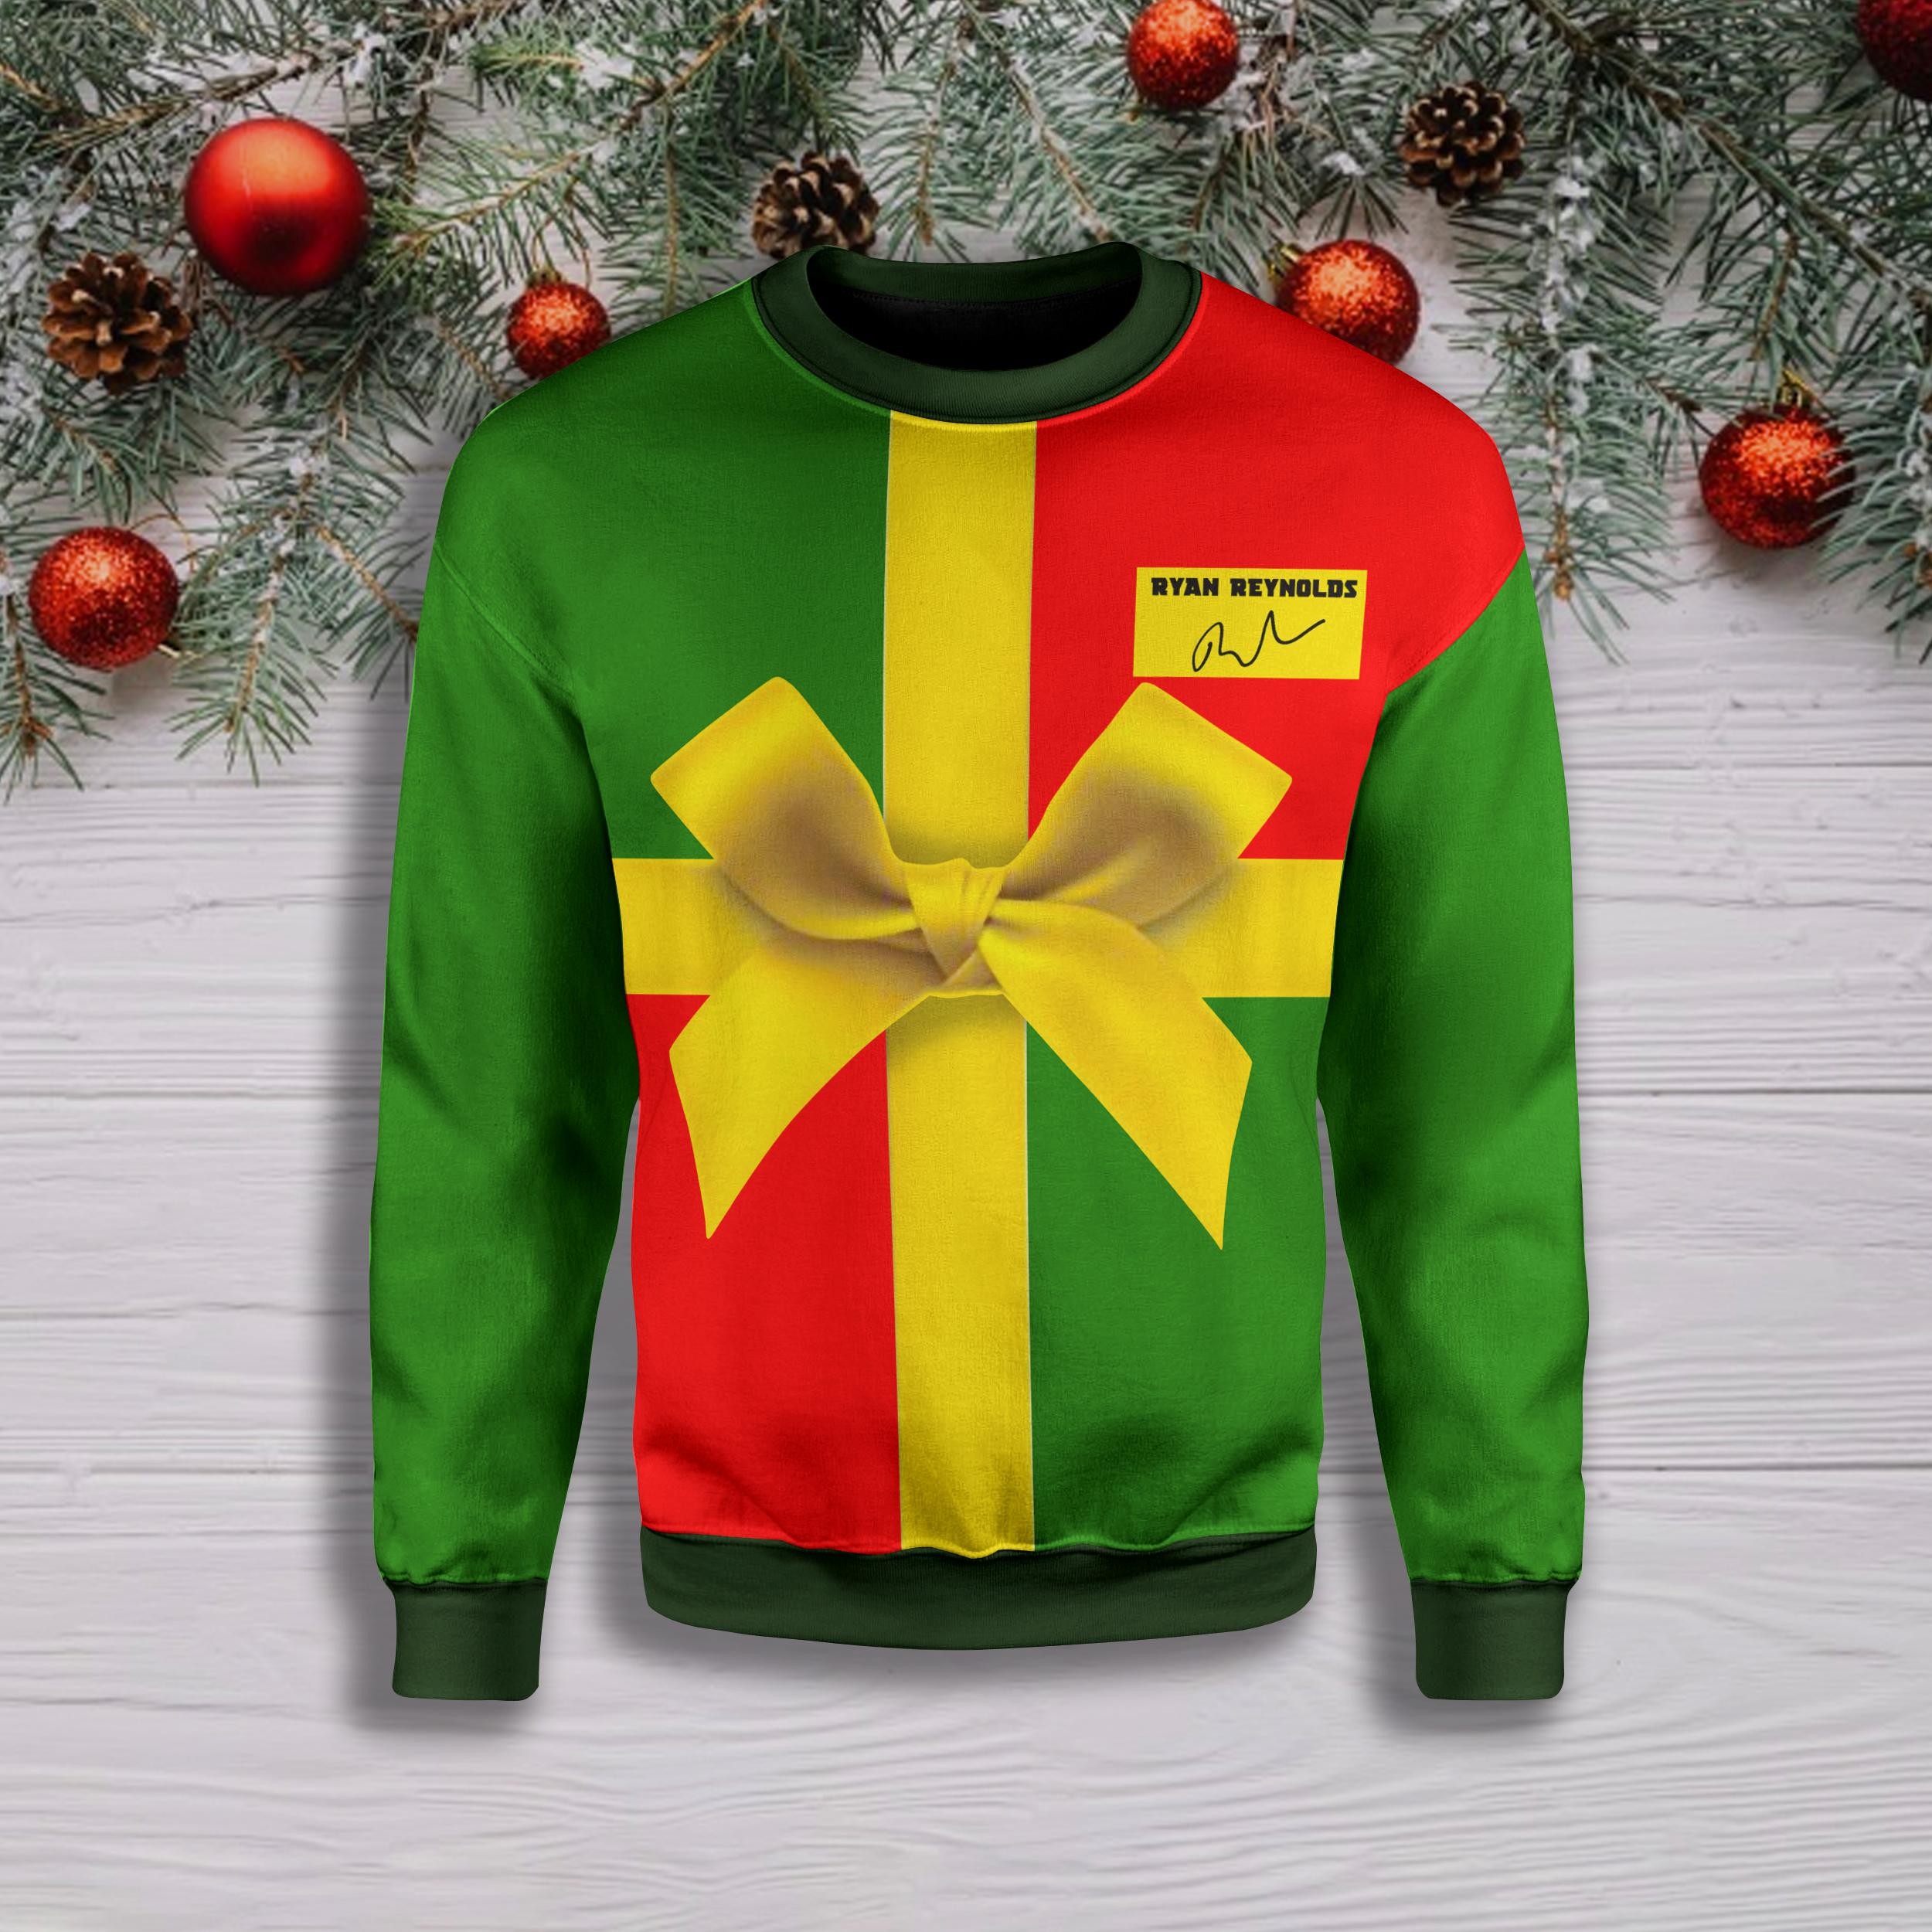 Ryan reynold full printing ugly christmas sweater 1